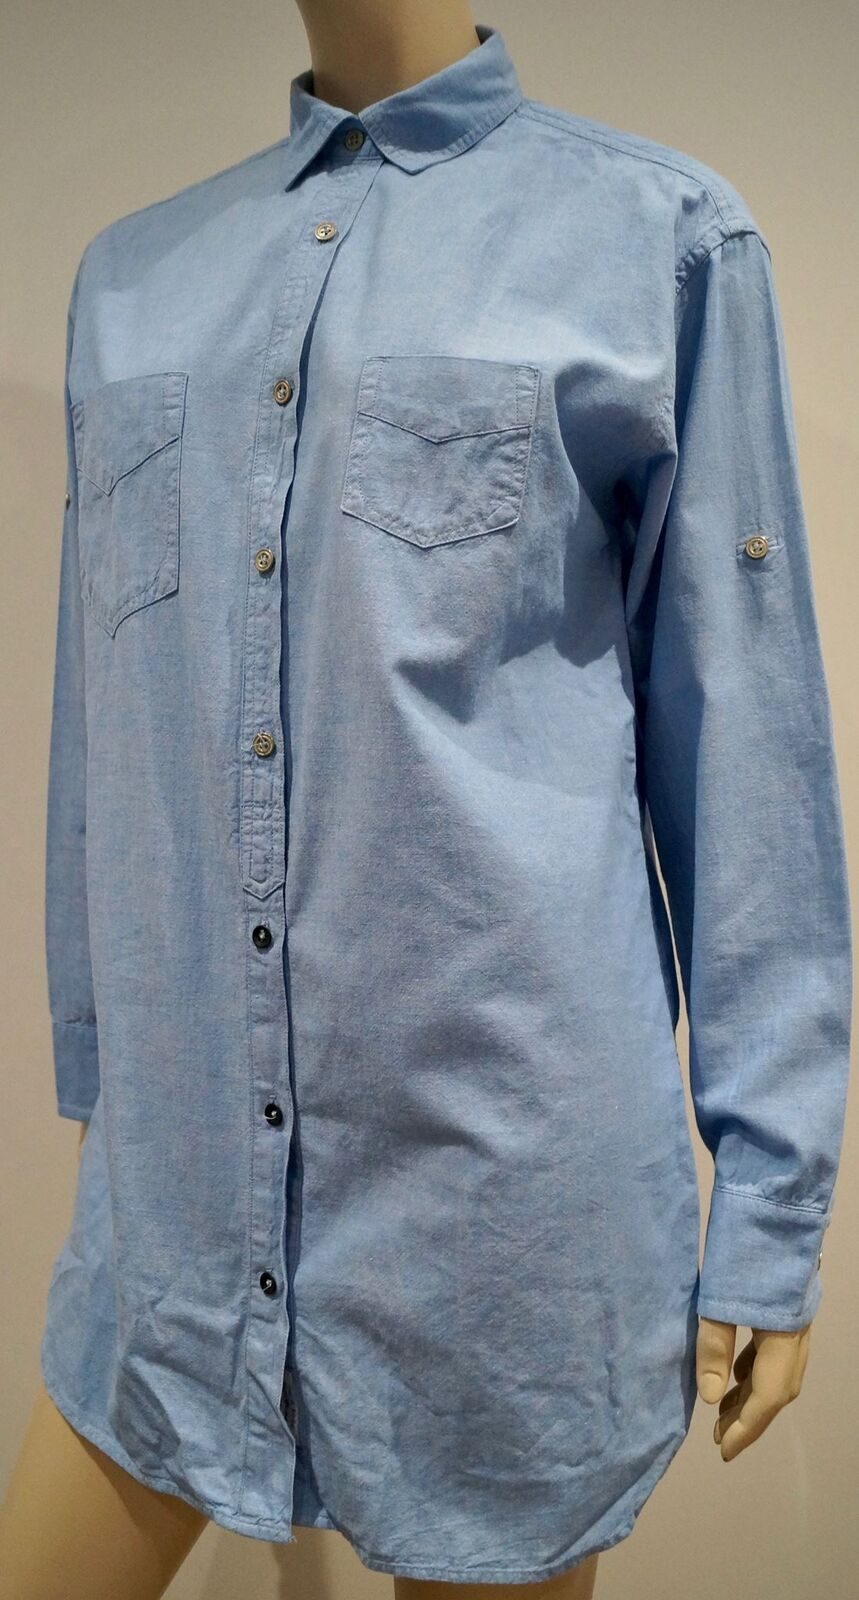 RAG & BONE NEW YORK Blau Cotton CollaROT Adjustable Sleeve Blouse Shirt Top 2;S